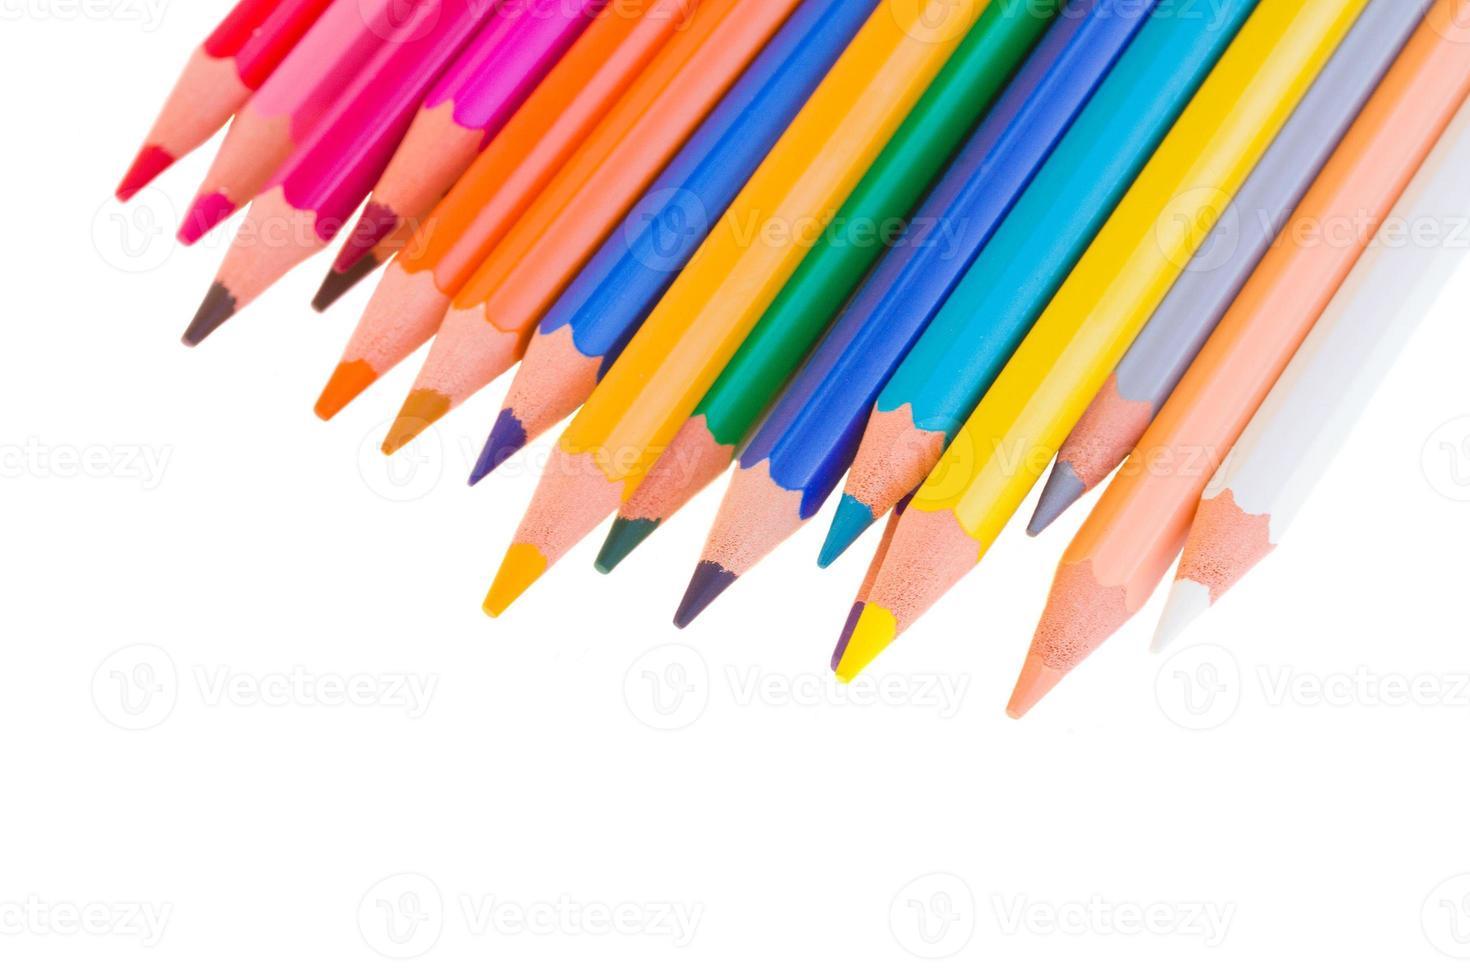 colorful pencils close up photo